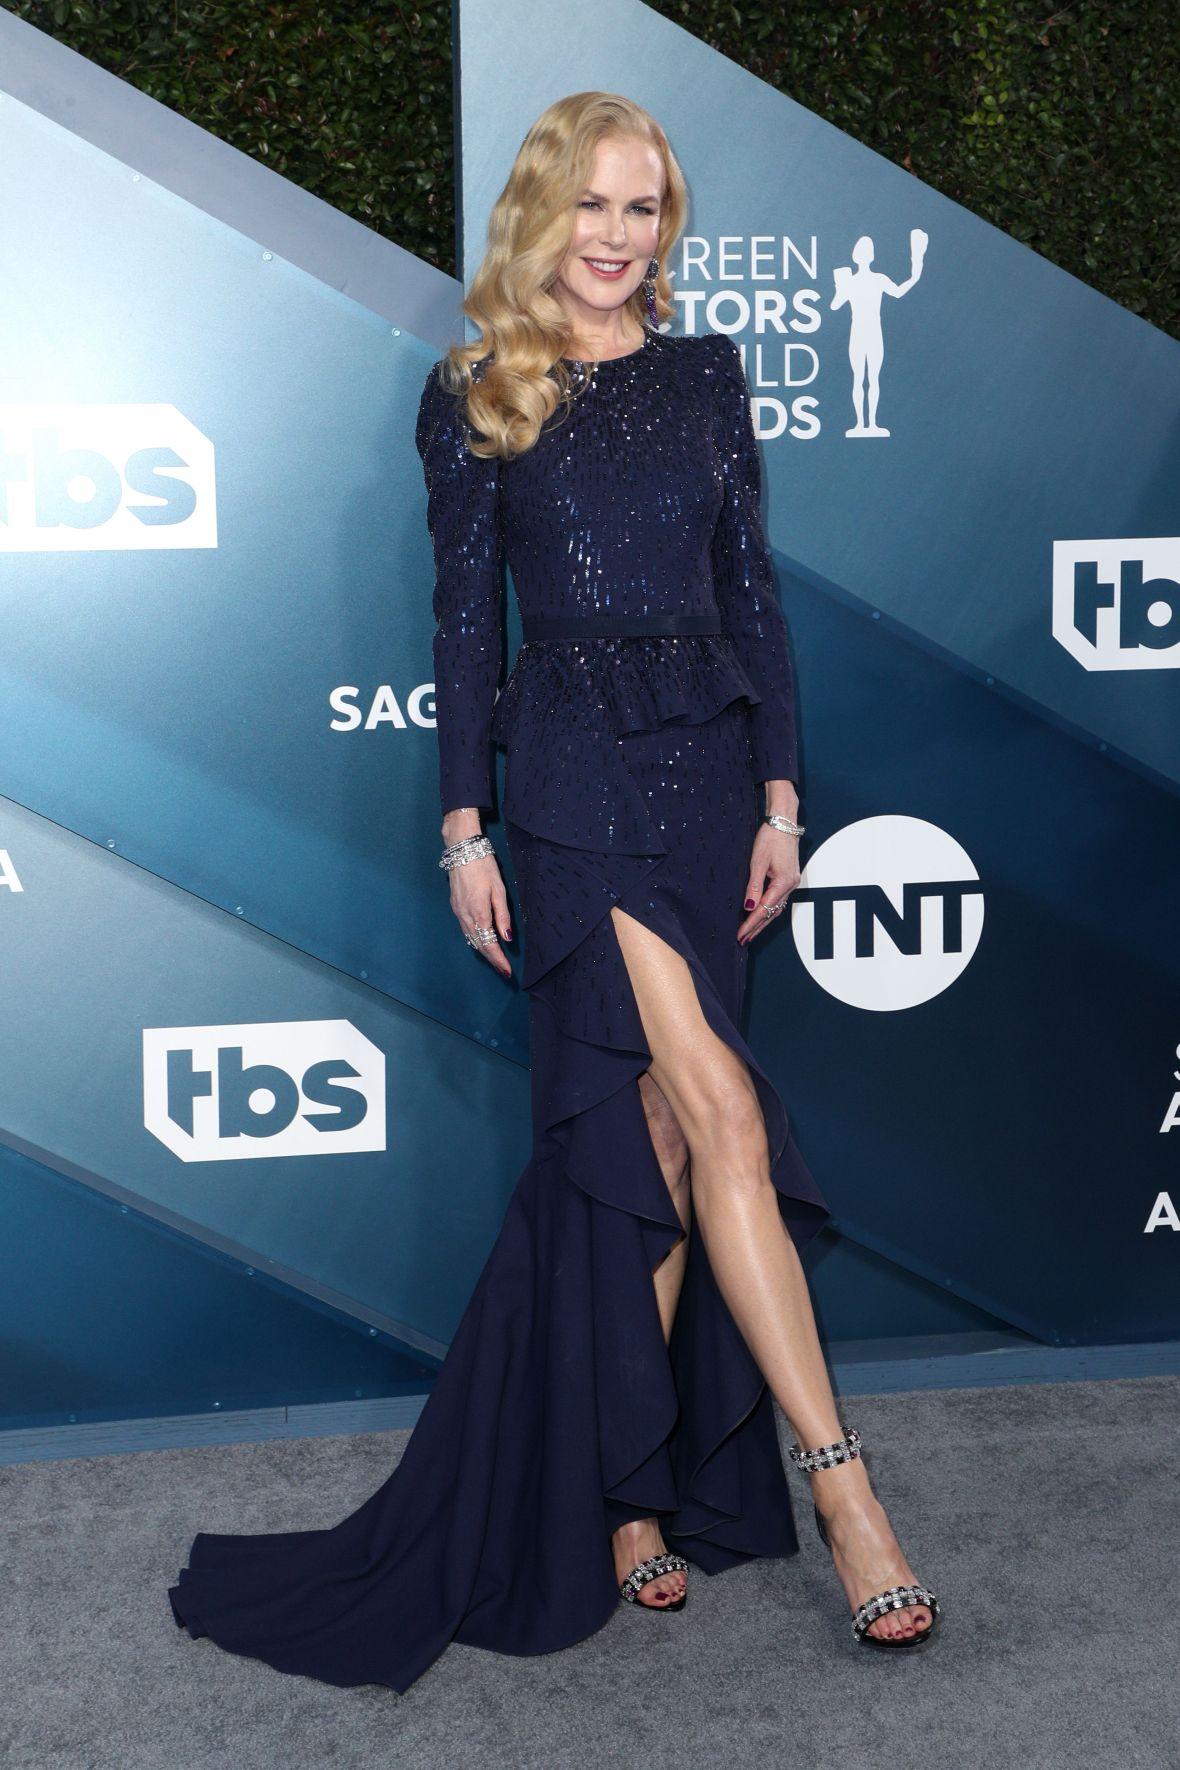 Nicole Kidman Shows Off Legs at 2020 SAG Awards